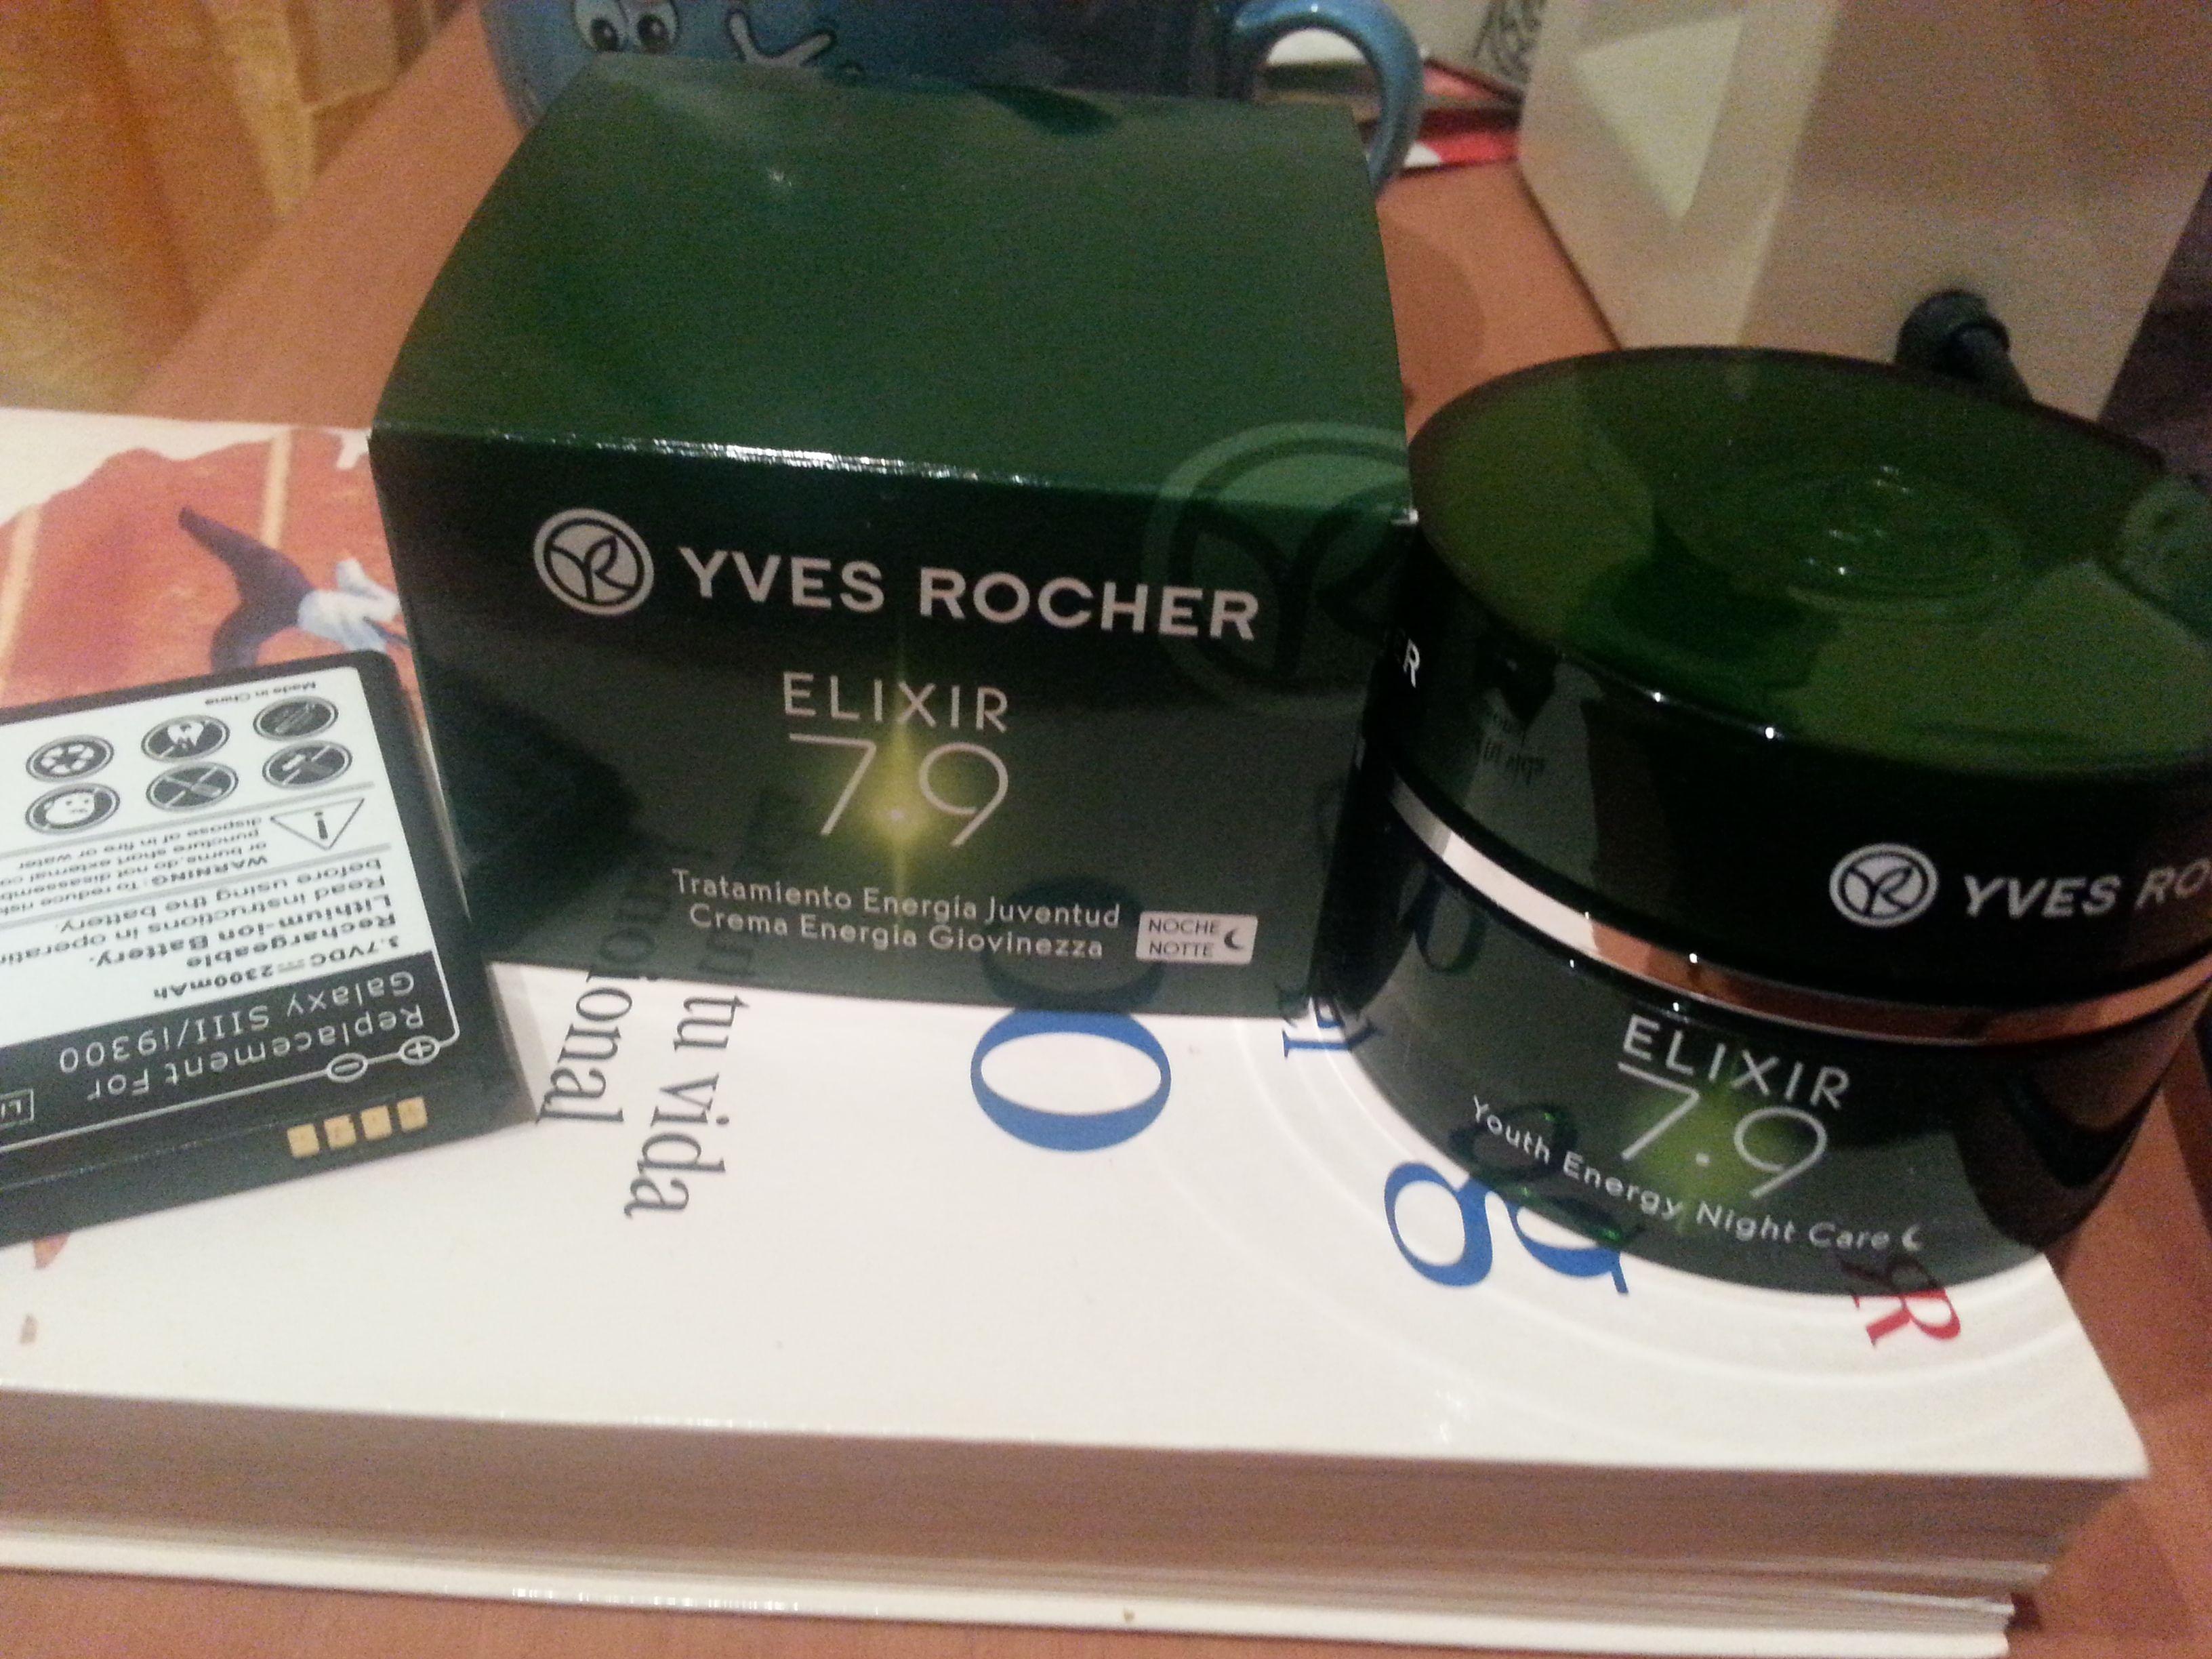 Cupón descuento del 50% en Yves Rocher. Exclusivo en Ahorradoras: http://ow.ly/qLMfw